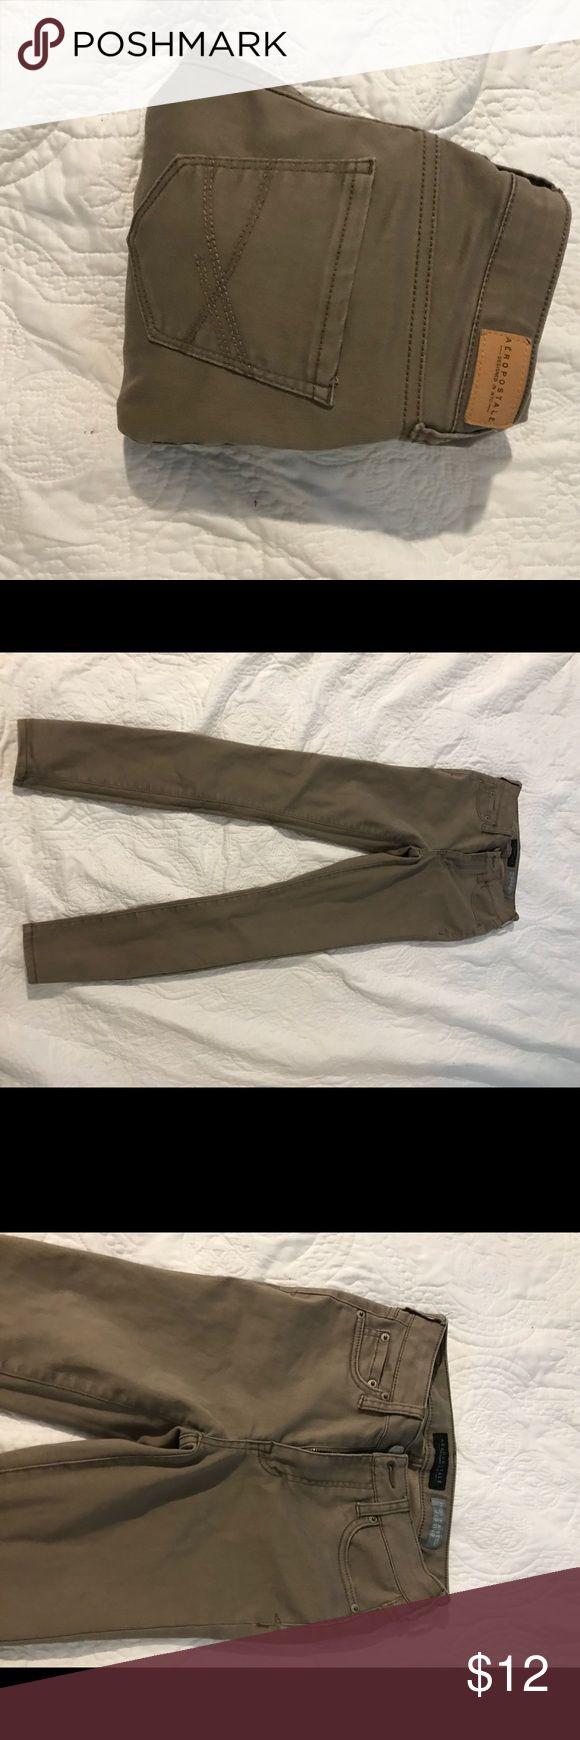 Khaki jeggings Khaki jean/legging pants that are high waisted Aeropostale Pants Skinny